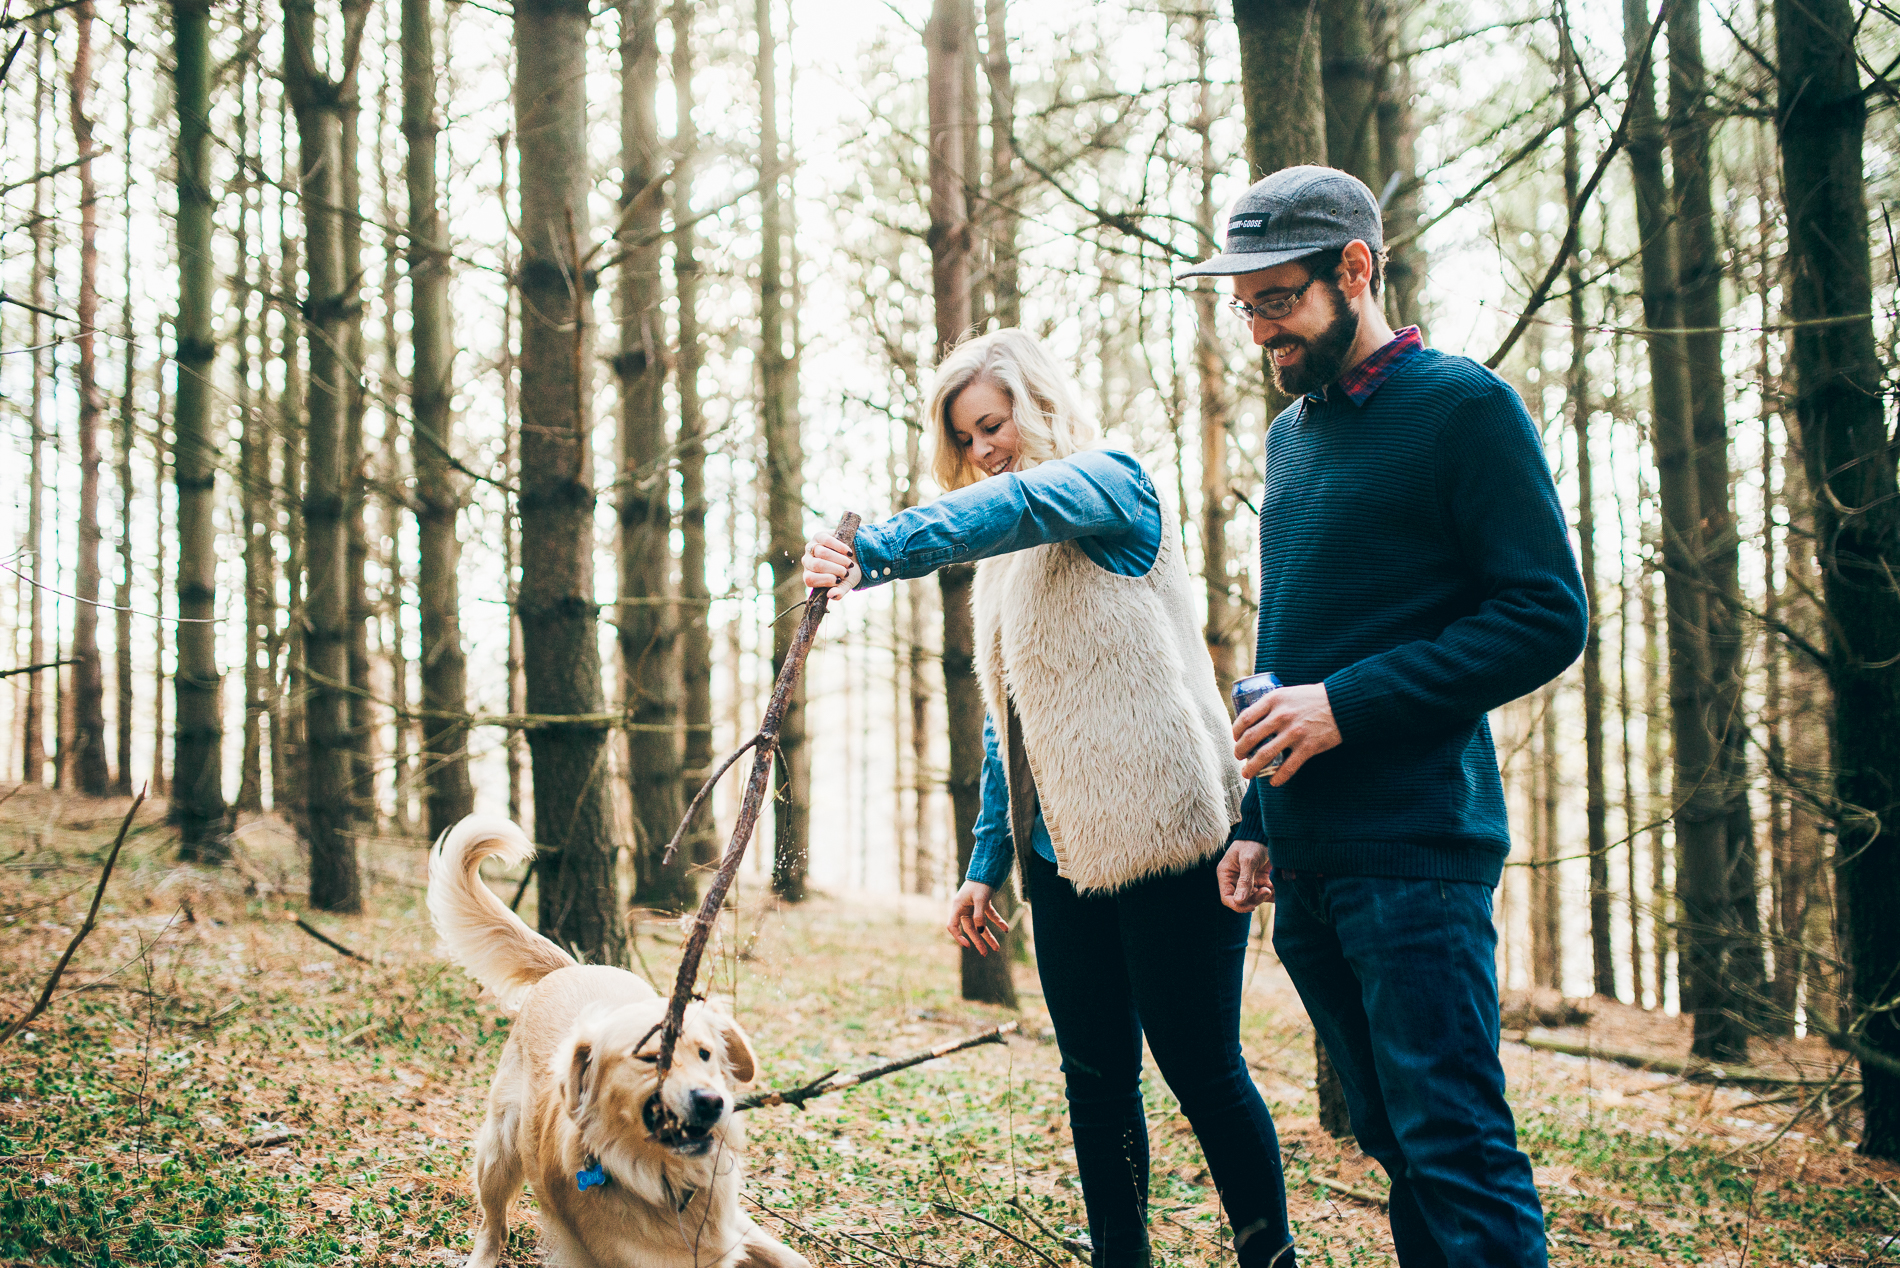 Winter-Forest-Engagement-Shoot-2